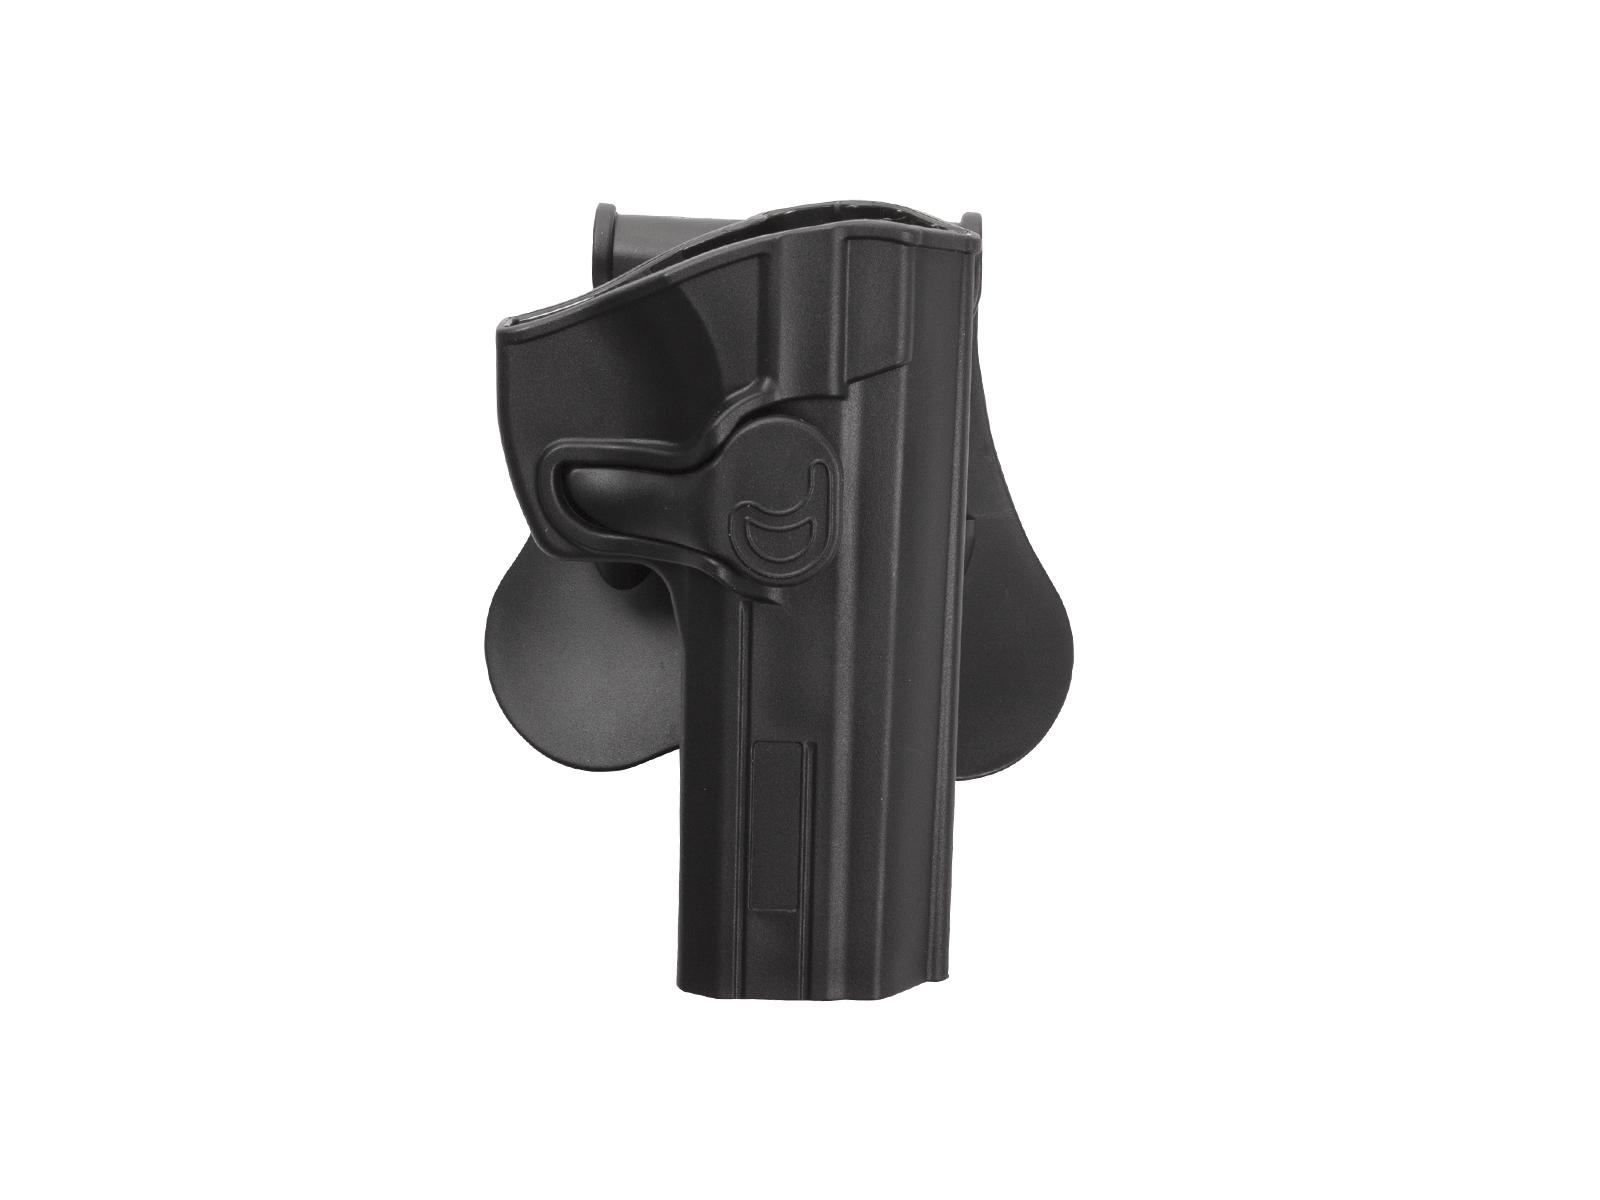 TEACA DIN POLYMER PENTRU SP-01 SHADOW - BLACK